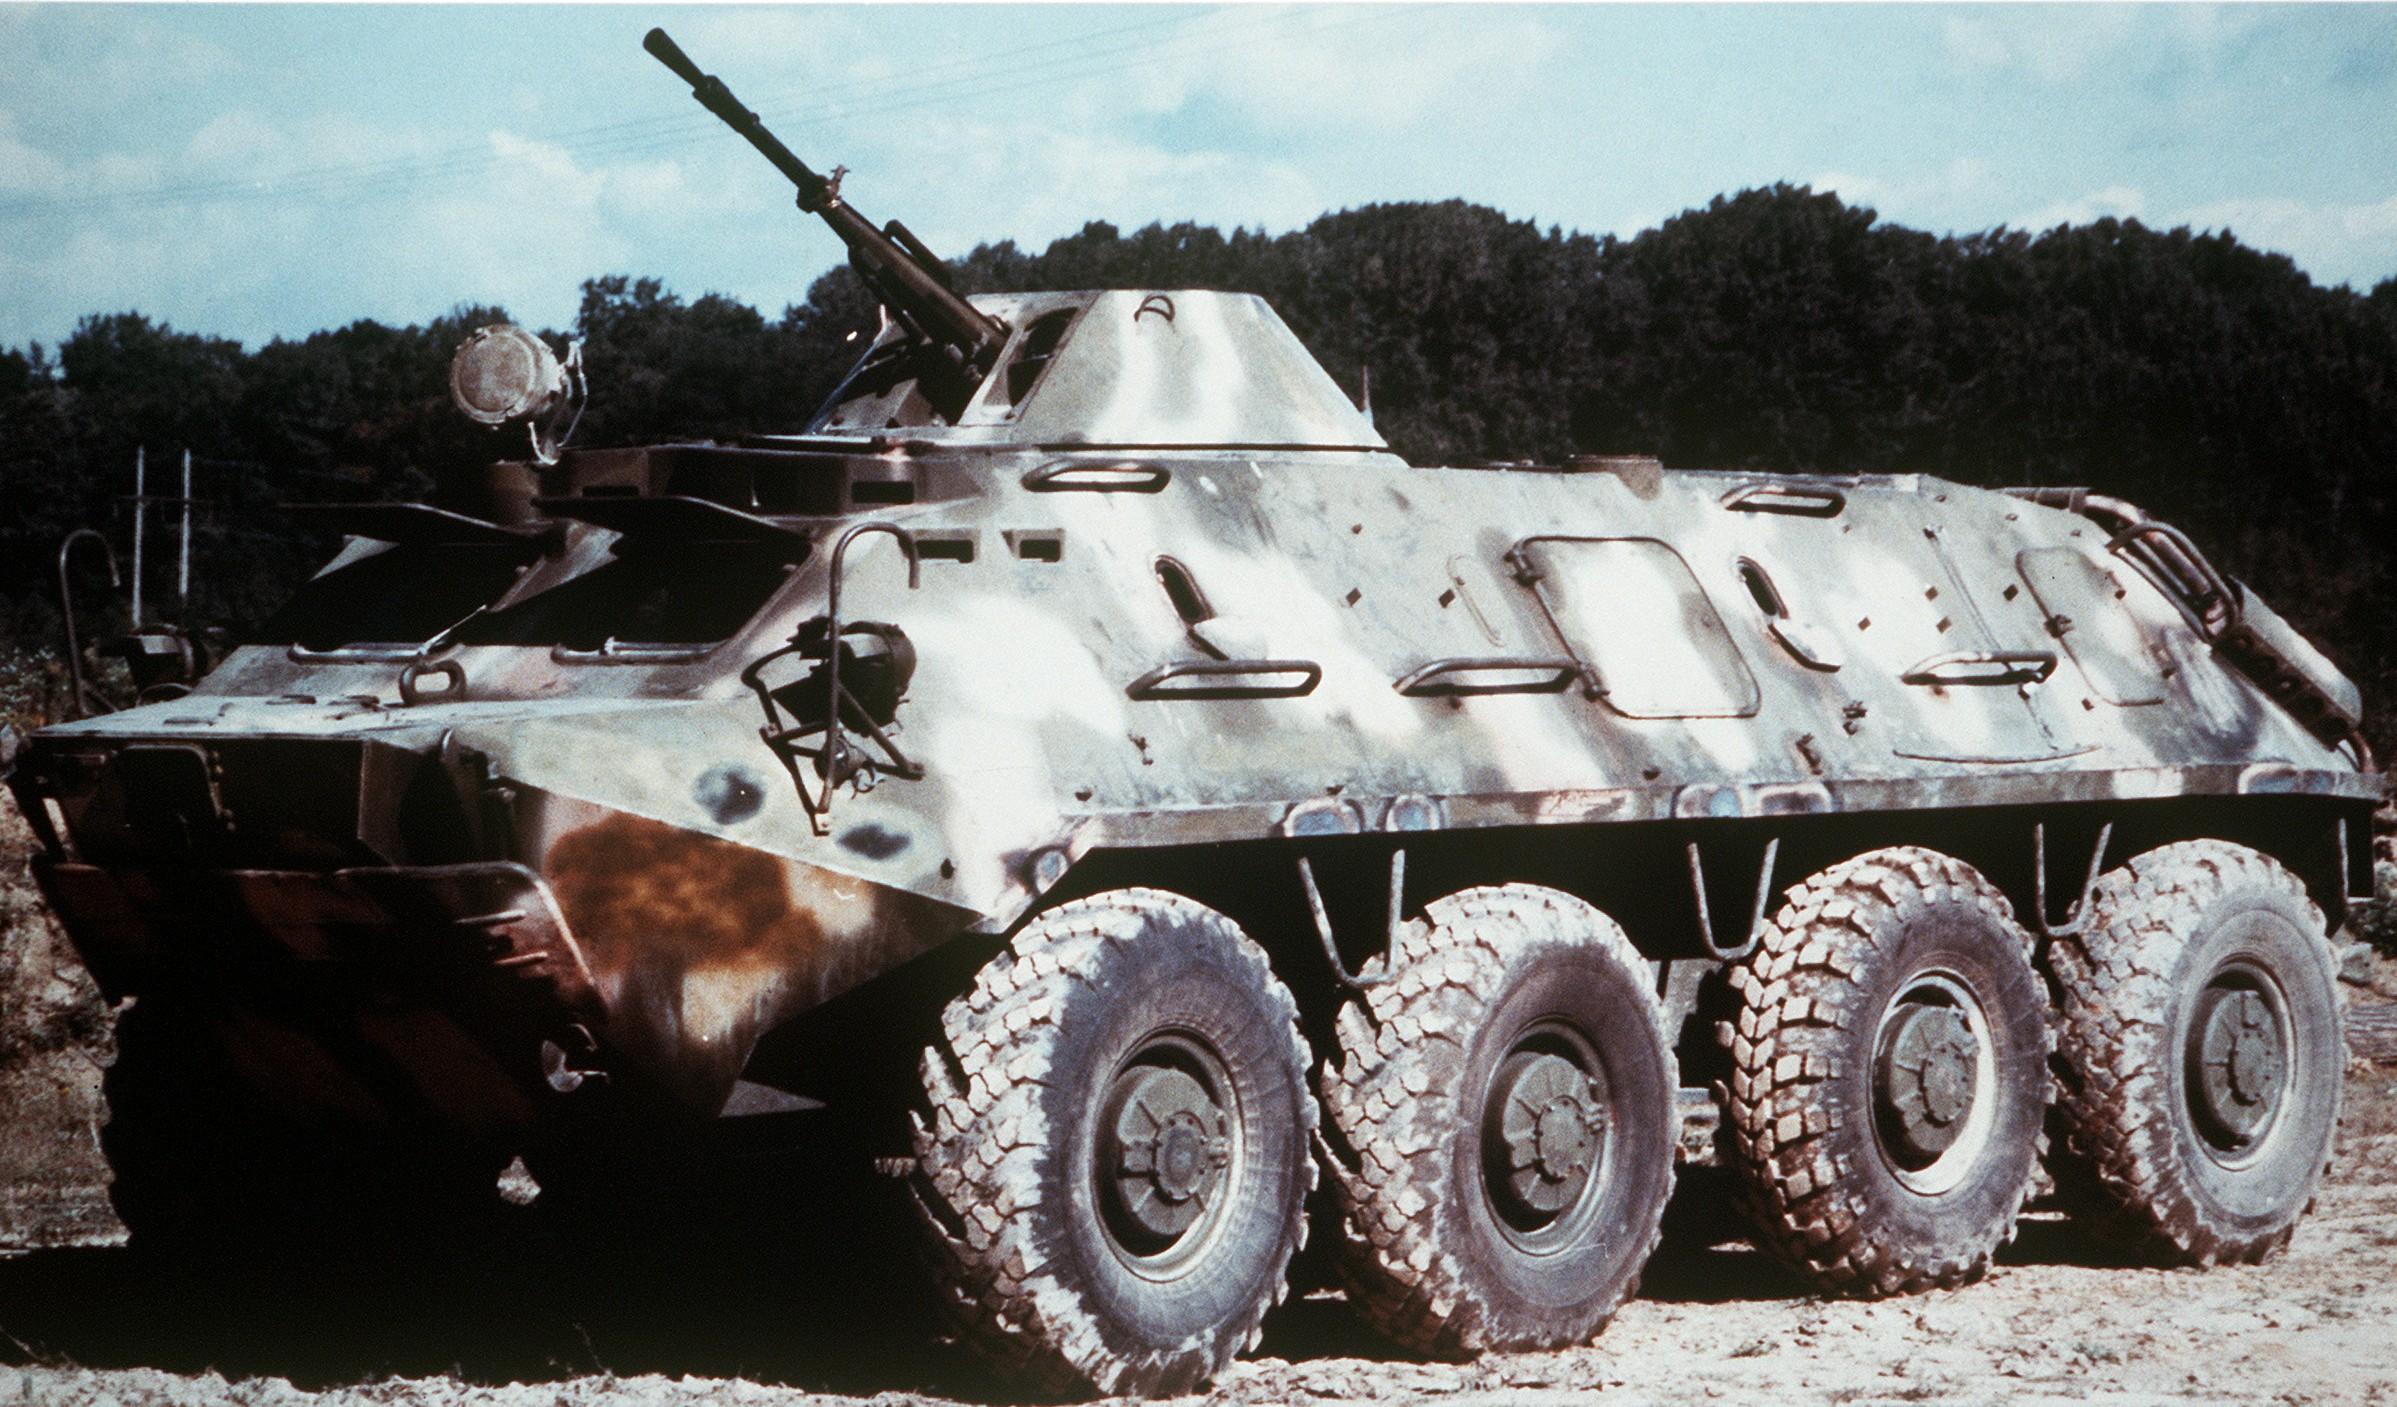 http://de.academic.ru/pictures/dewiki/66/BTR-60PB_DA-ST-89-06597.jpg